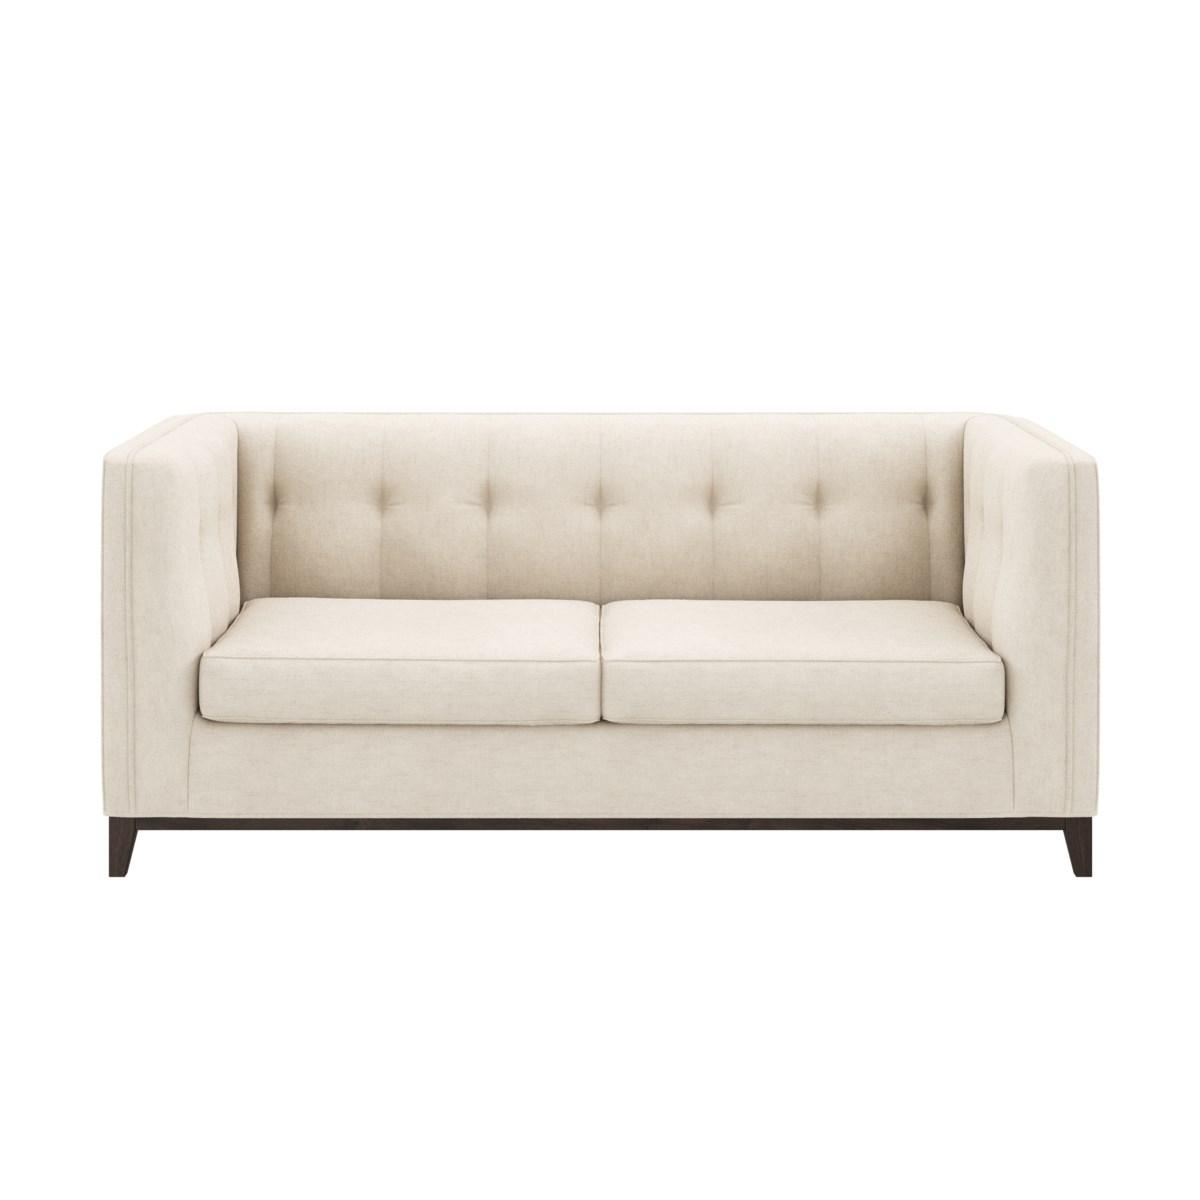 Lagos Sleeping Sofa In Amstredam 22 fabric